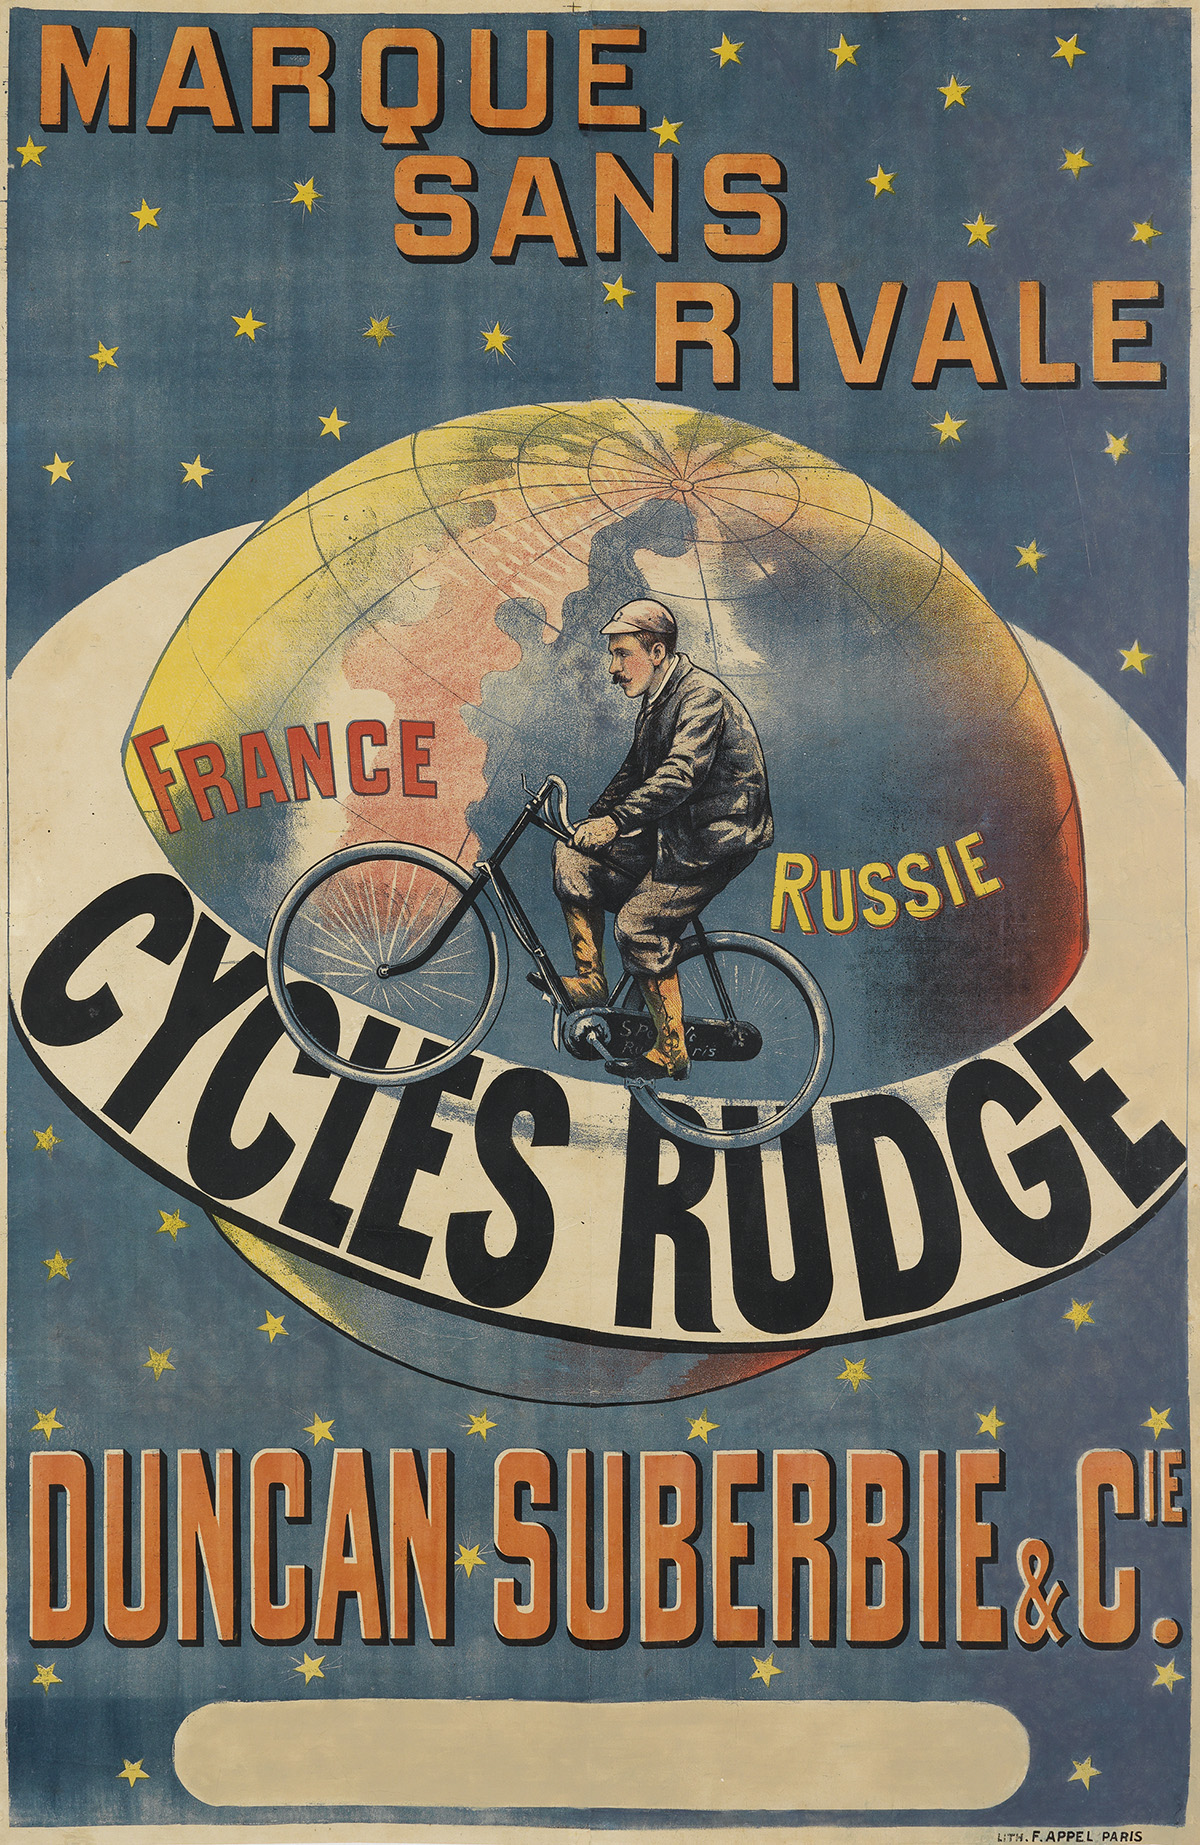 DESIGNER UNKNOWN. CYCLES RUDGE / MARQUE SANS RIVALE. Circa 1896. 58x38 inches, 149x97 cm. F. Appel, Paris.